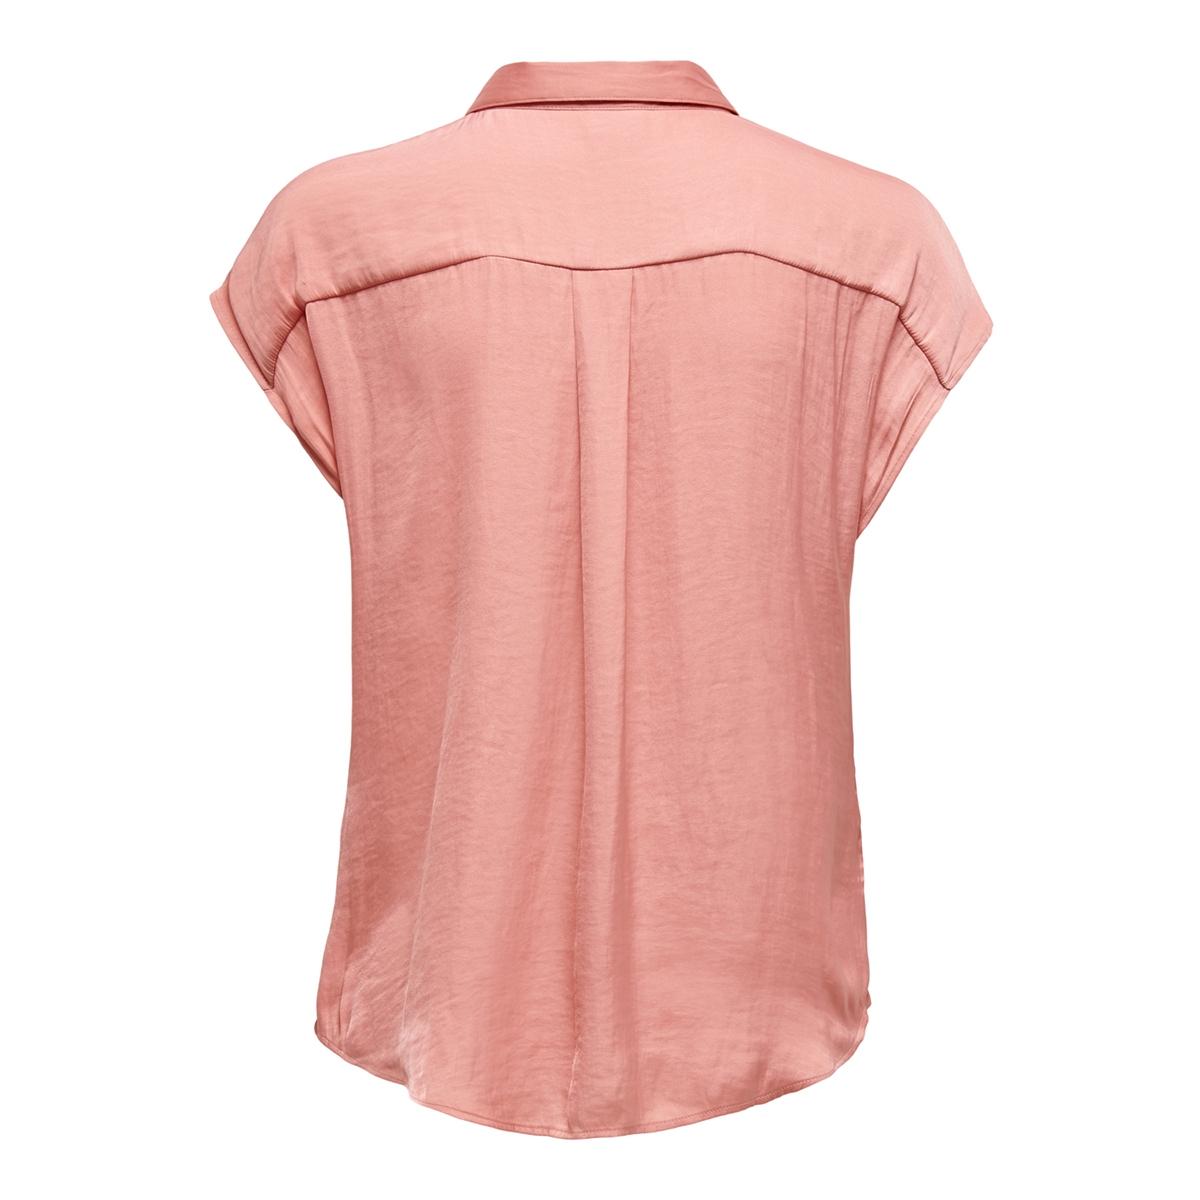 jdysheela s/s shirt wvn 15196788 jacqueline de yong blouse peach blossom